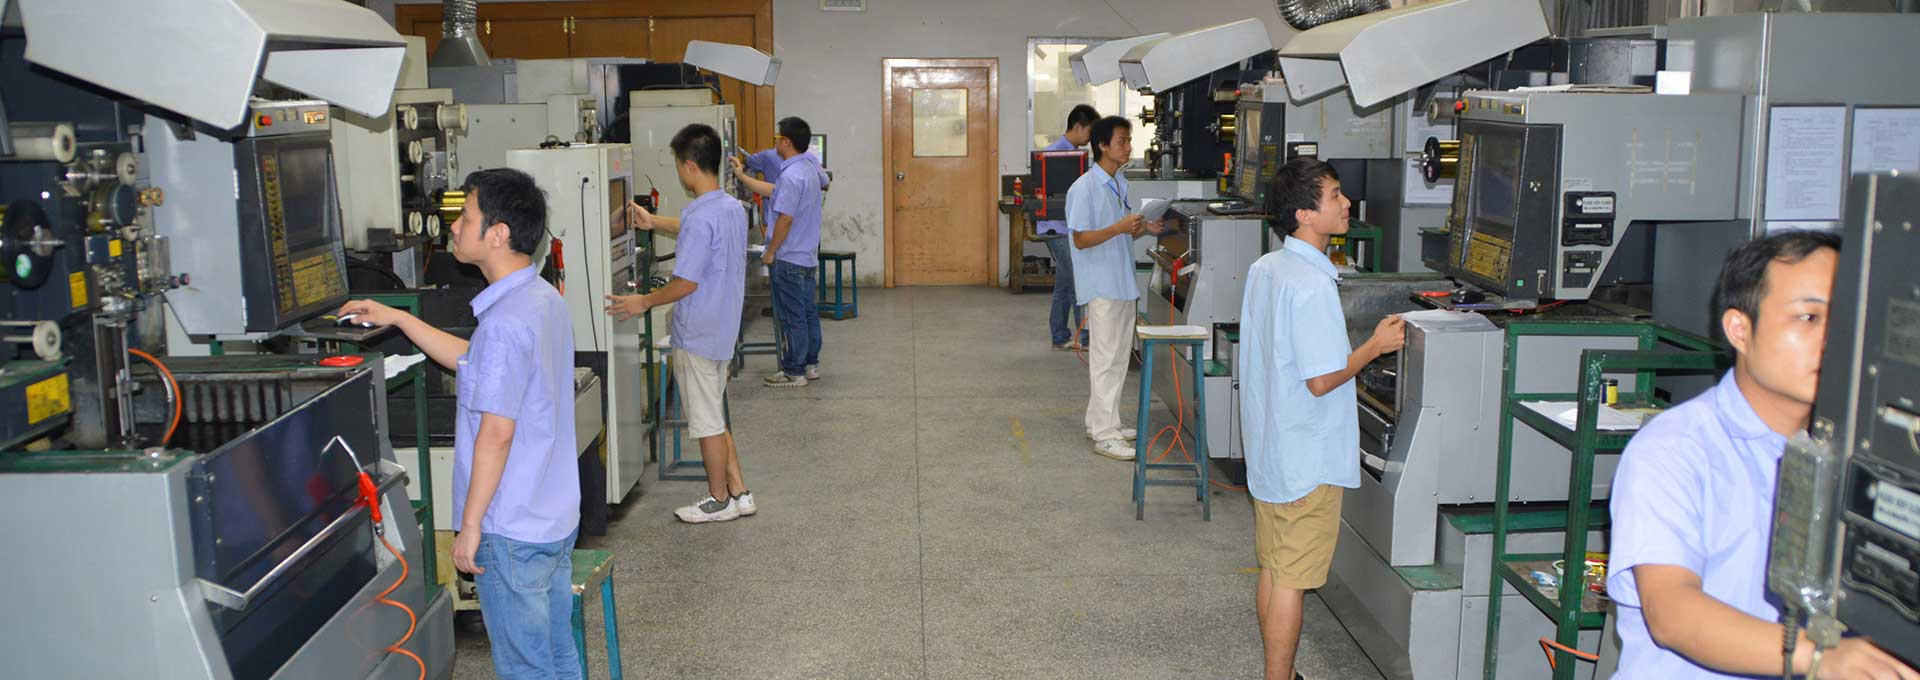 plastic mold manufacturing workshop